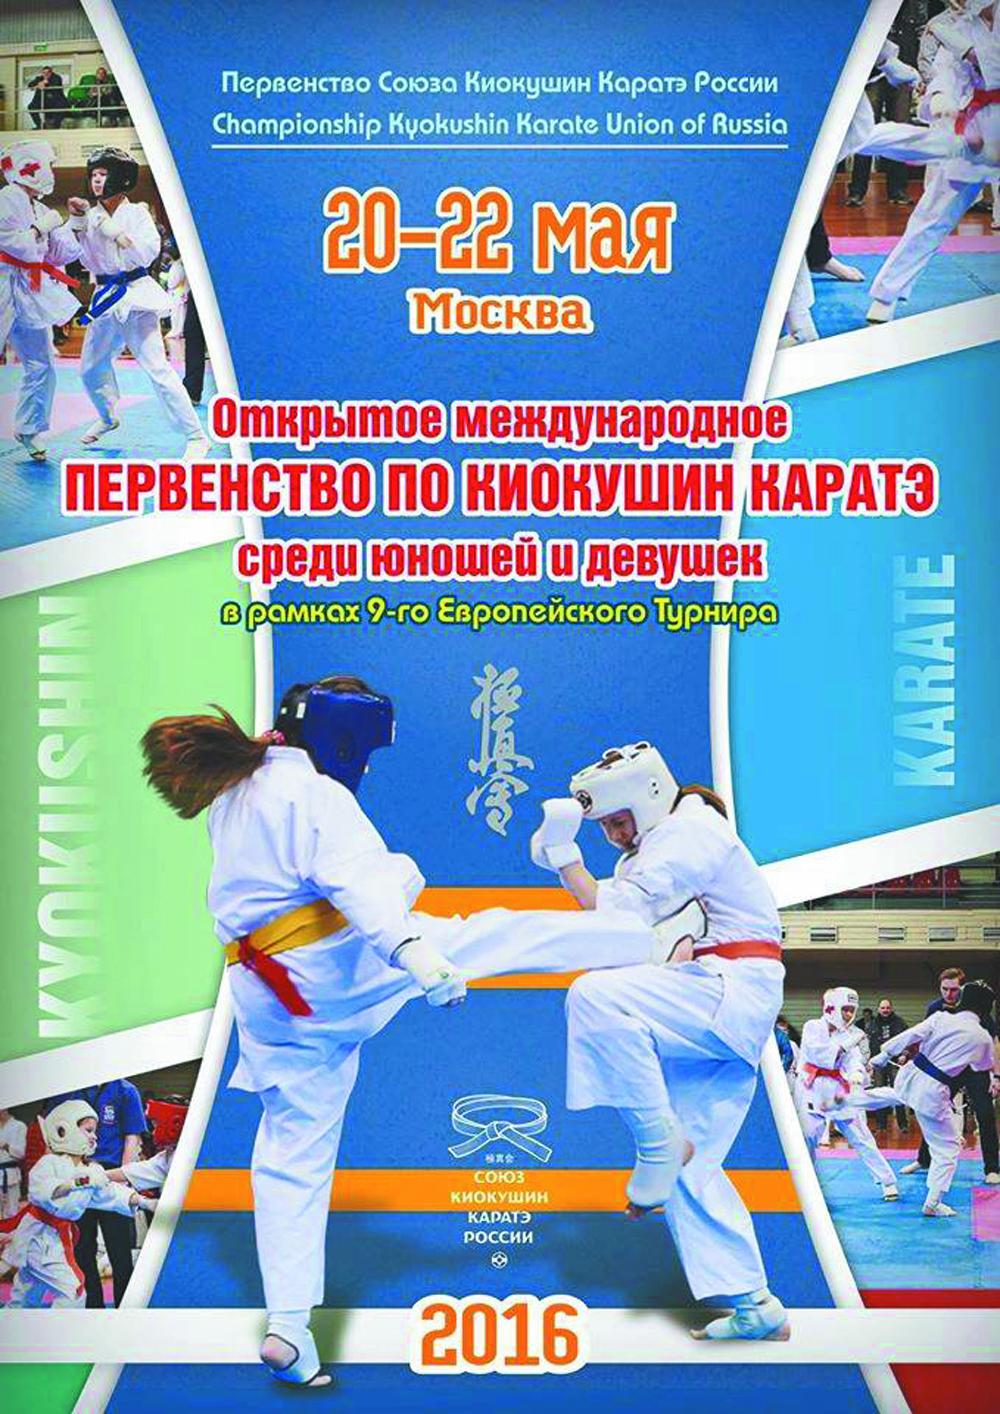 Nippon Budo Sport Tulcea, prezent la Campionatul European de Karate Kyokushin de la Moscova